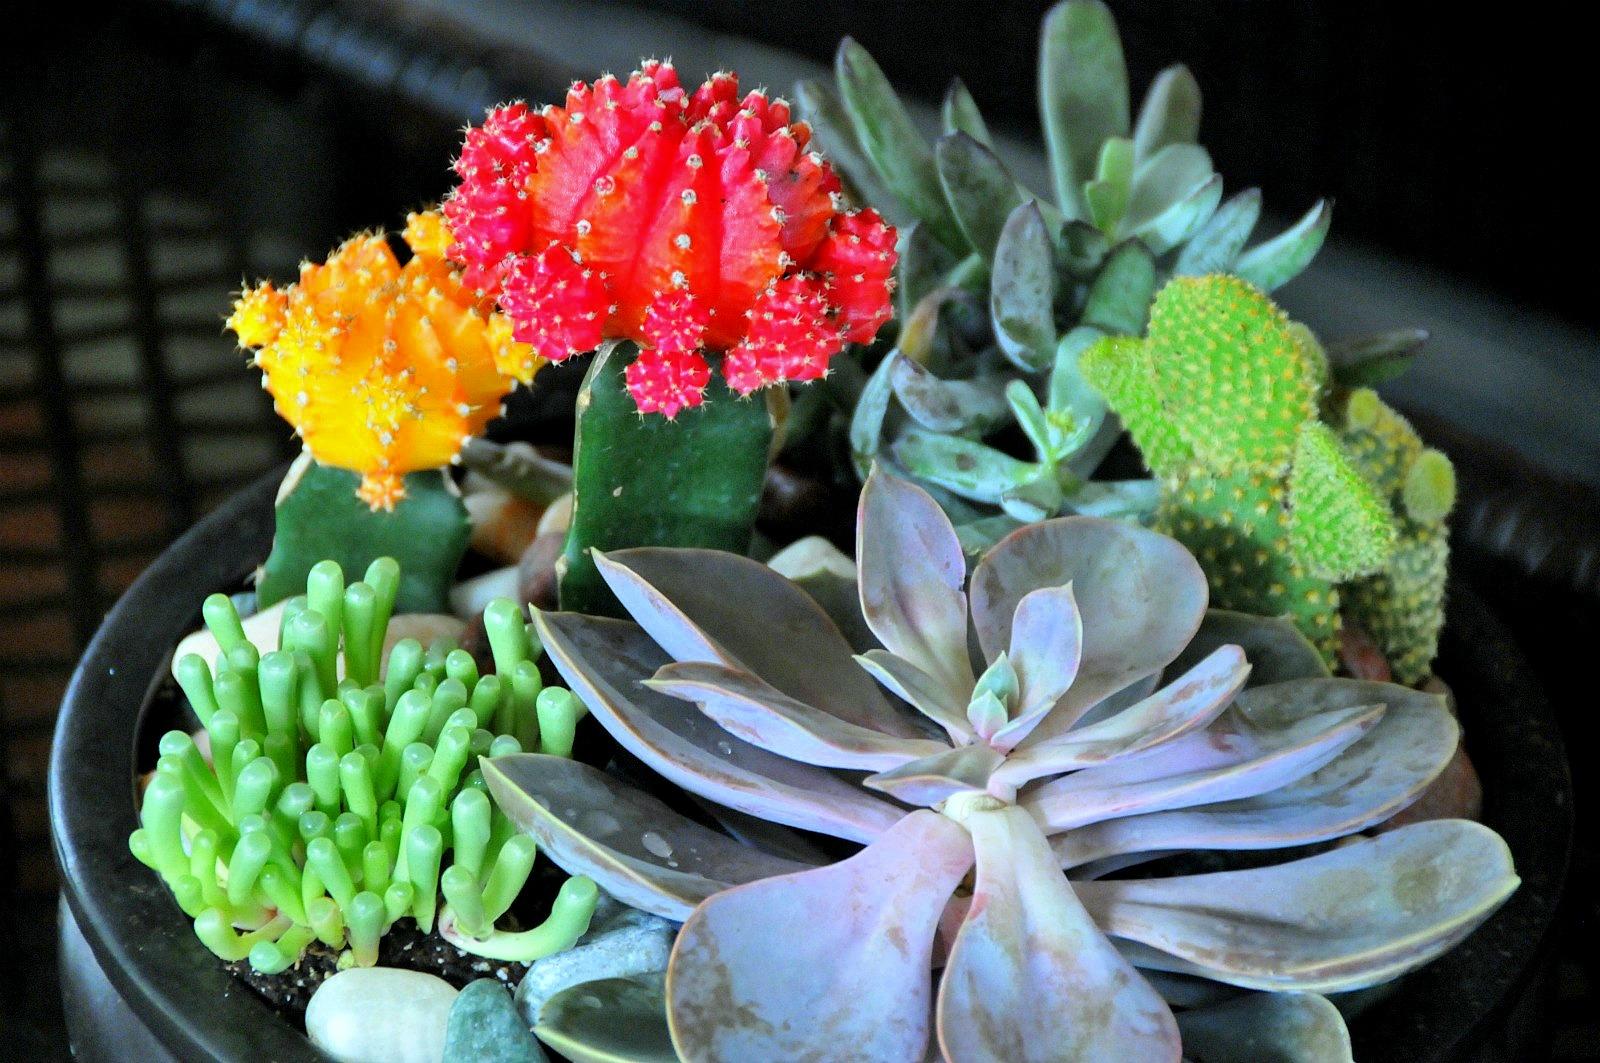 The Cactus Garden That Was She Kept A Parrot